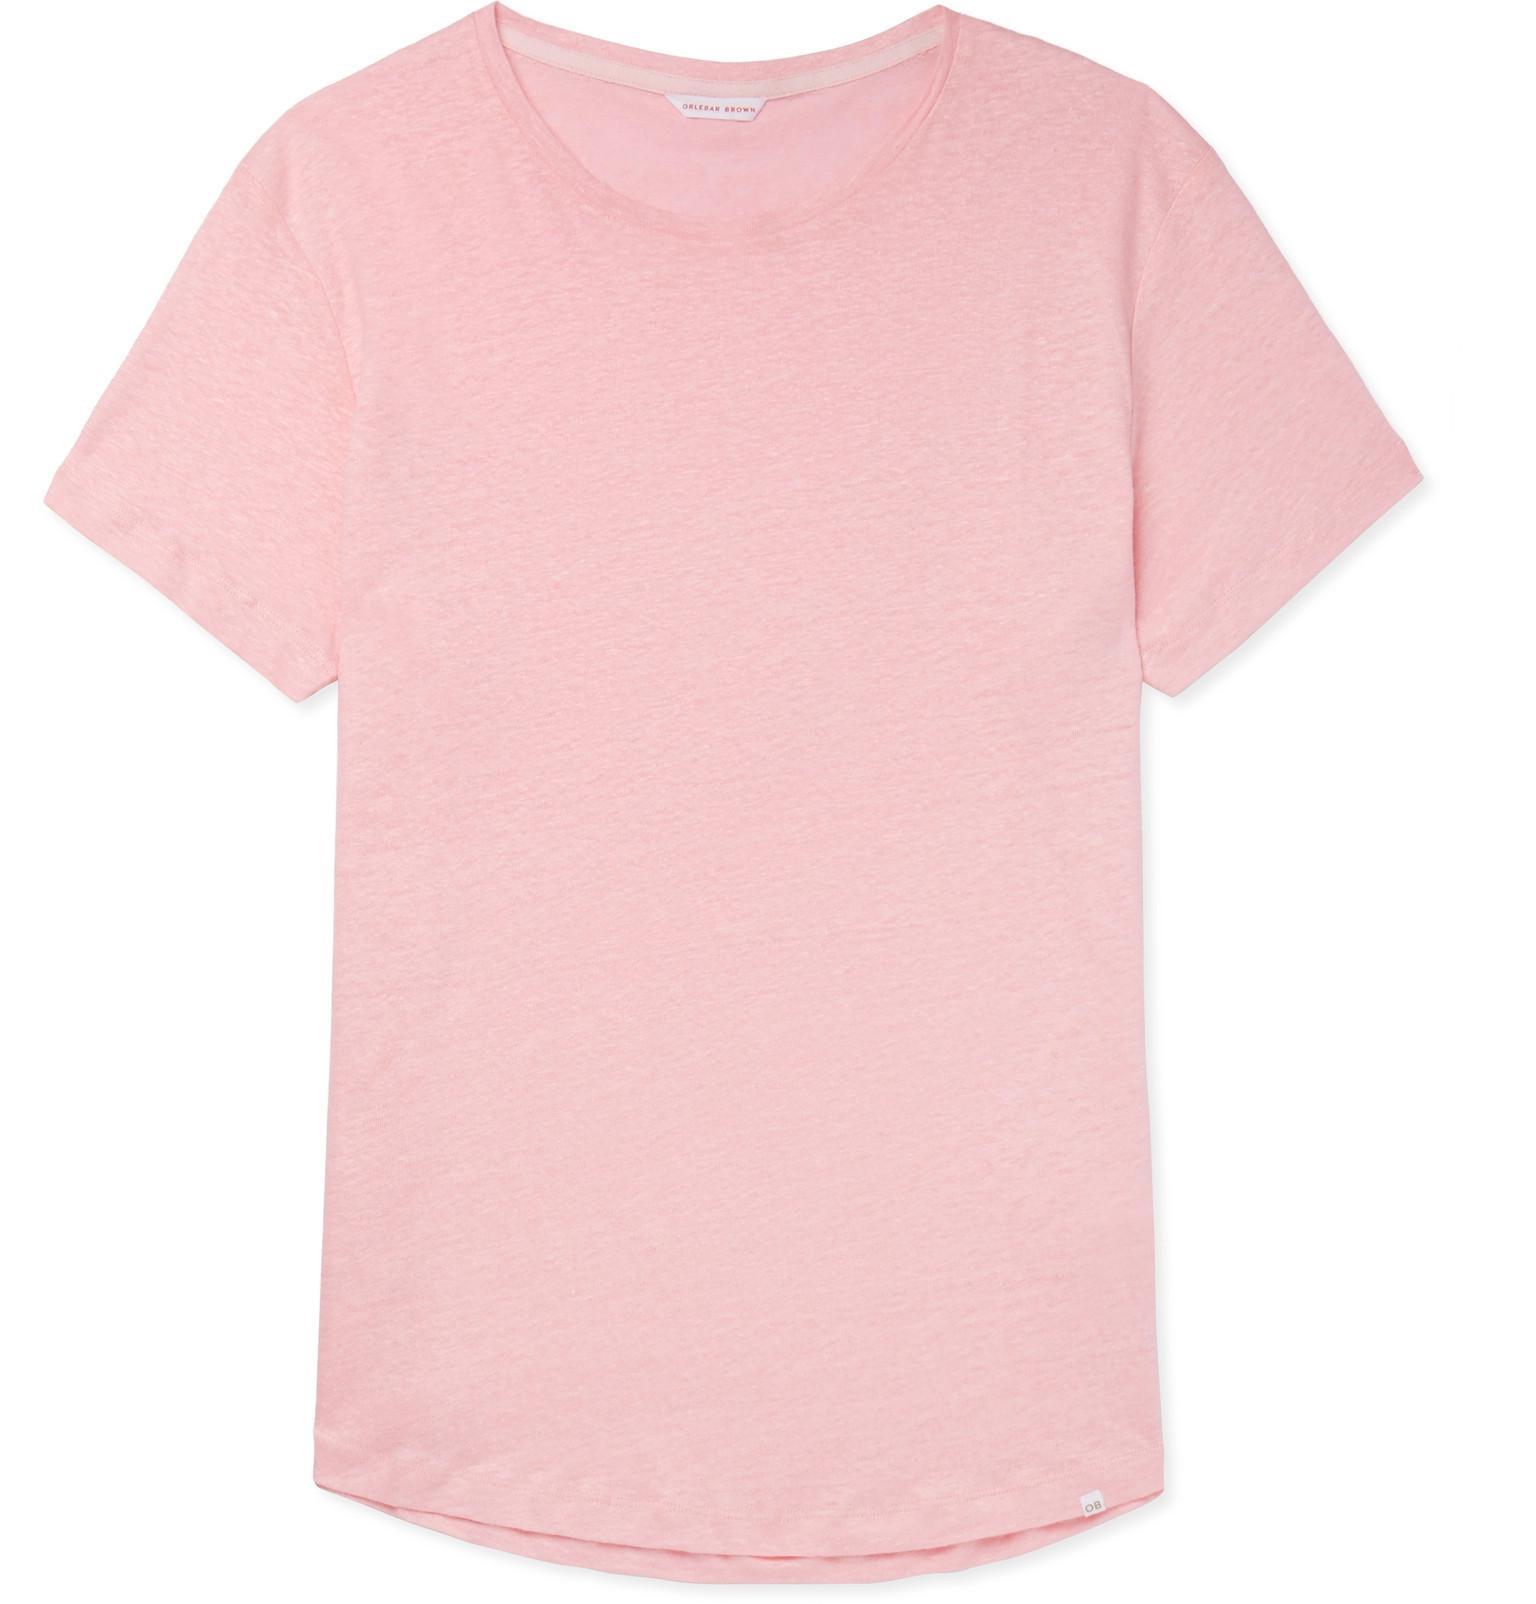 Orlebar Brown Ob-t Slim-fit Linen T-shirt - Pink OO1FU5